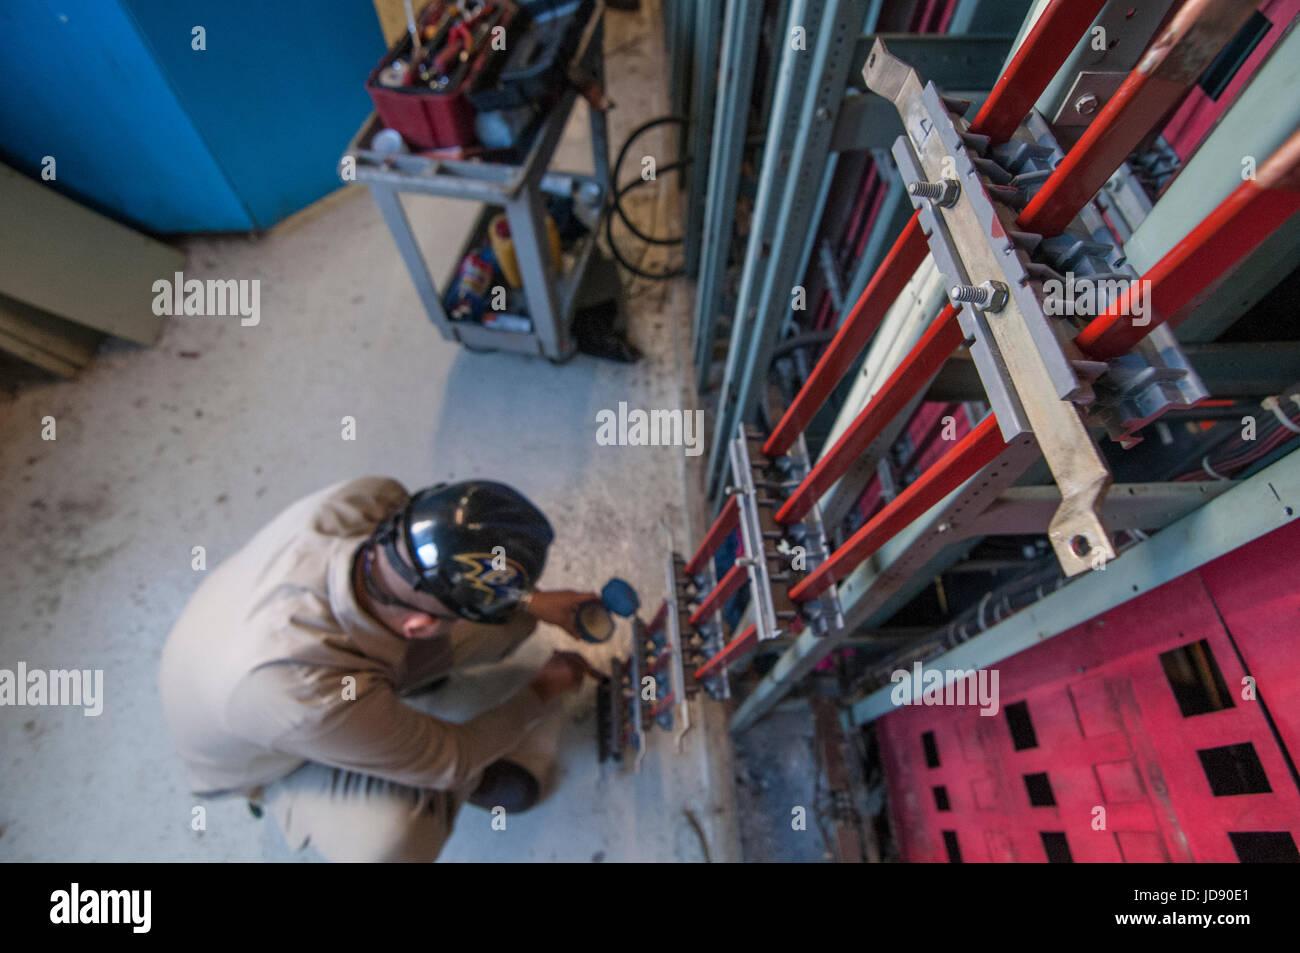 480 volts bus bar maintenance jobs in geothermal power plant CERRO PRIETO. Comision Federal De Electricidad. - Stock Image